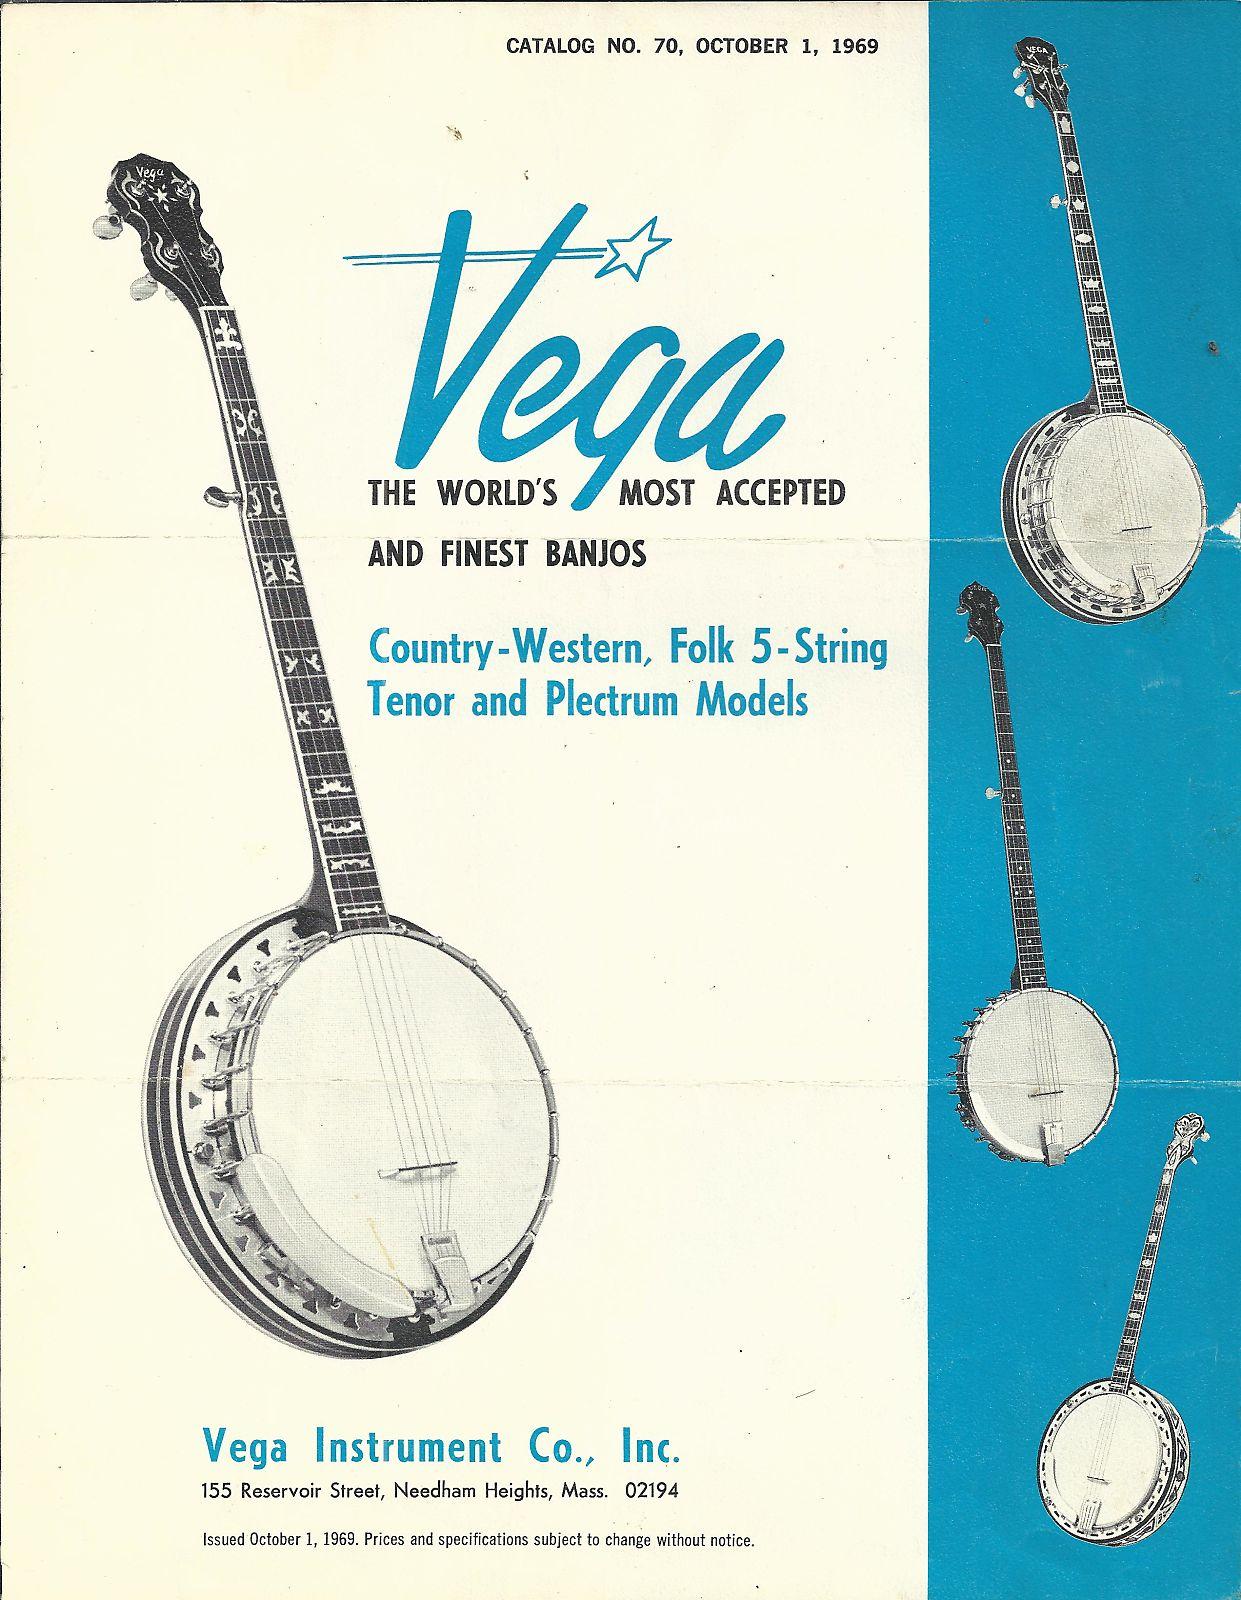 Vega-Catalog, 1969